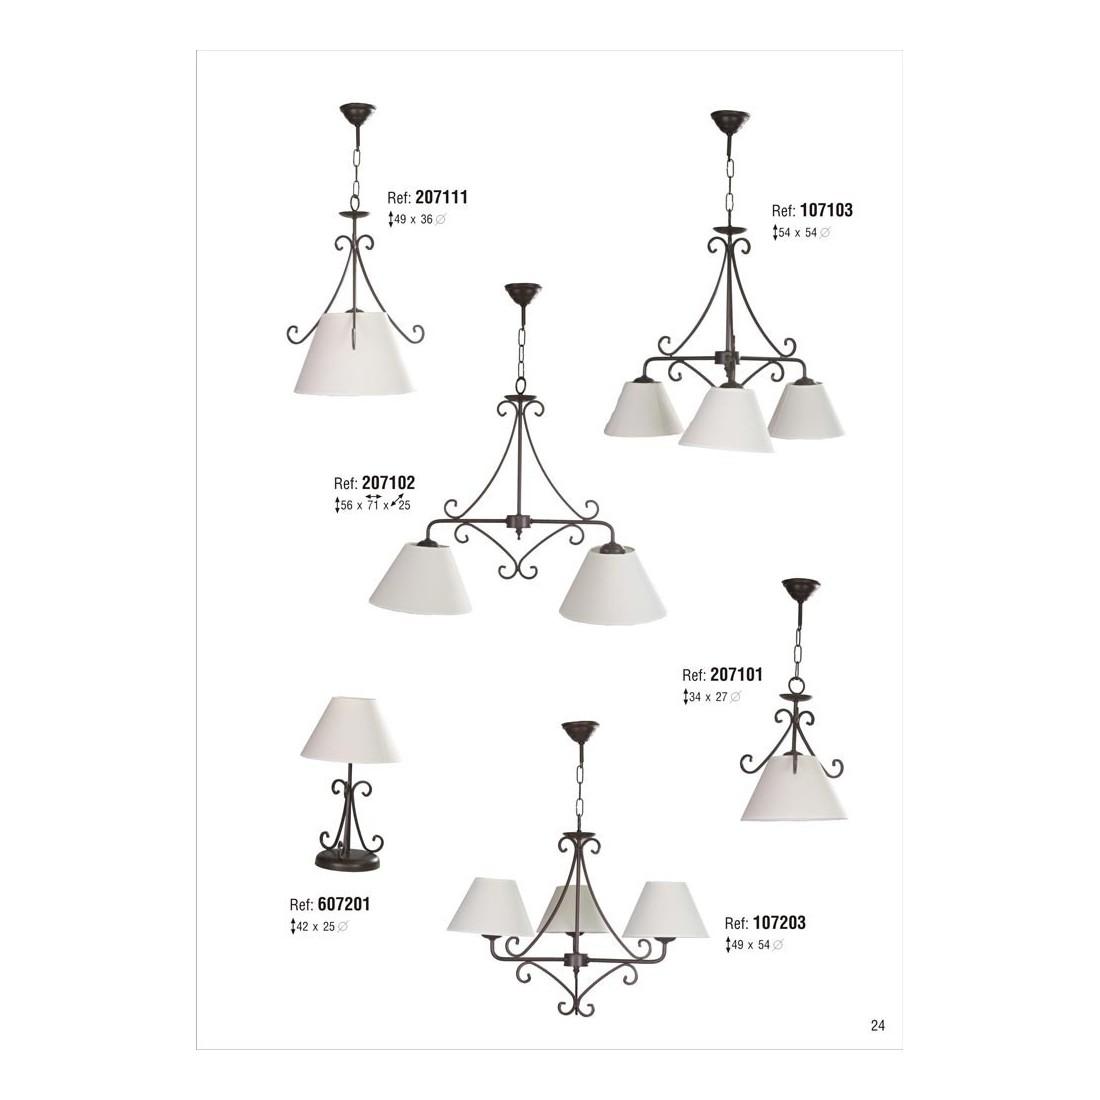 Lamparas Para Baño Baratas:lamparas forja, lamparas forja online, lamparas forja salon, lamparas